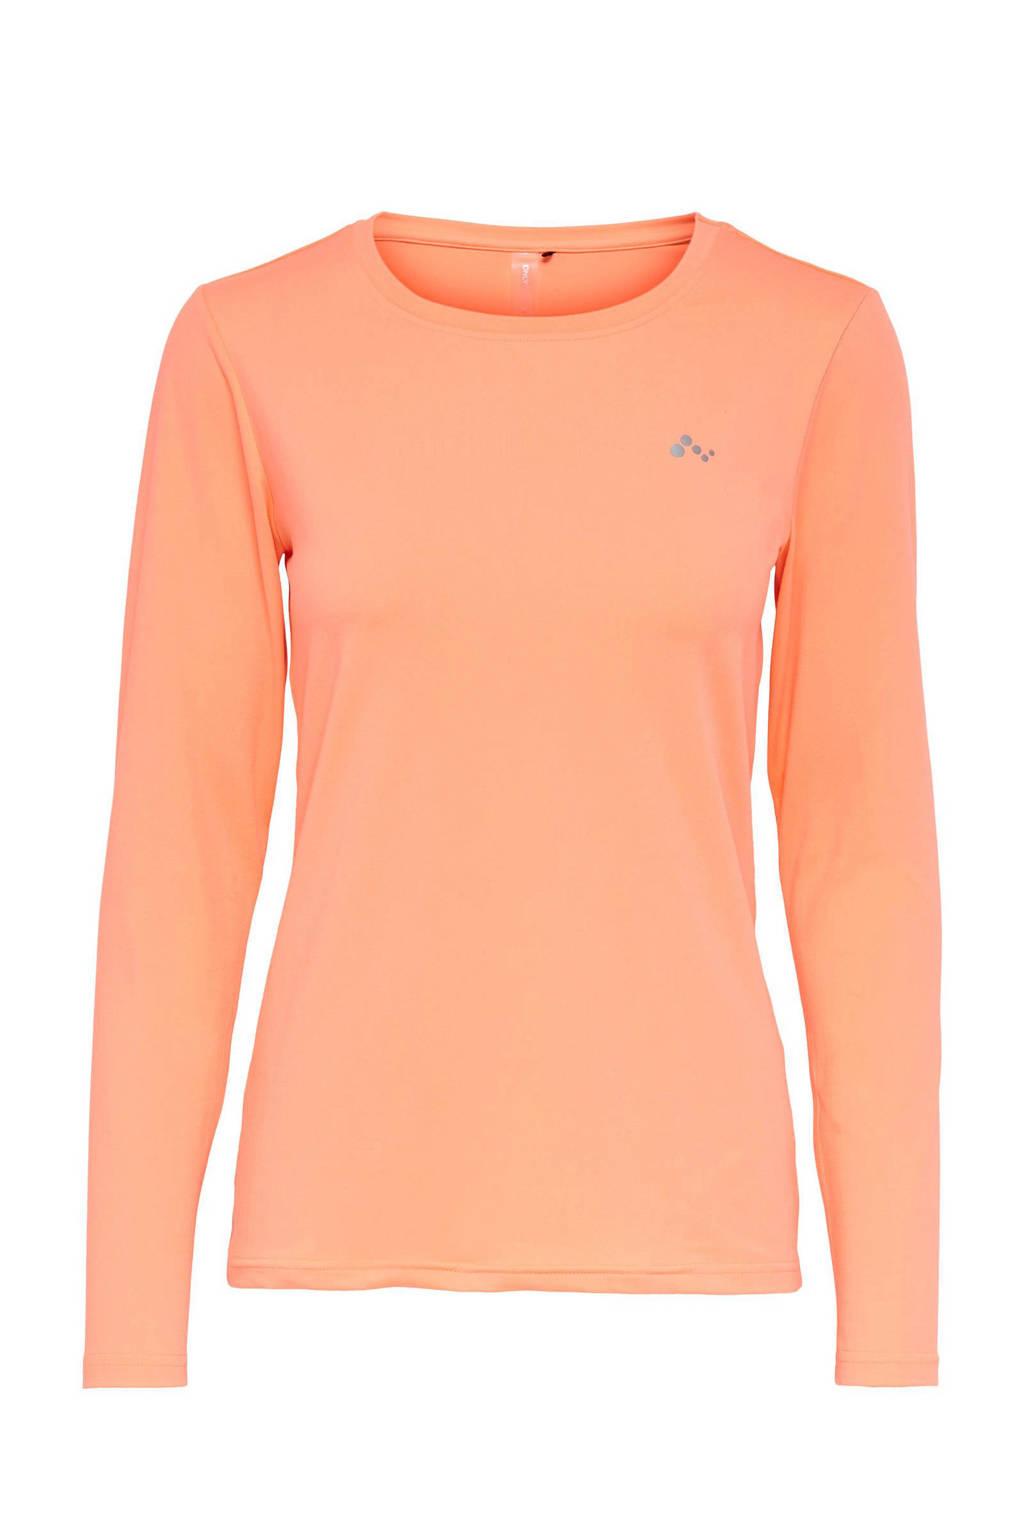 ONLY PLAY sport T-shirt Clarisa oranje, Oranje